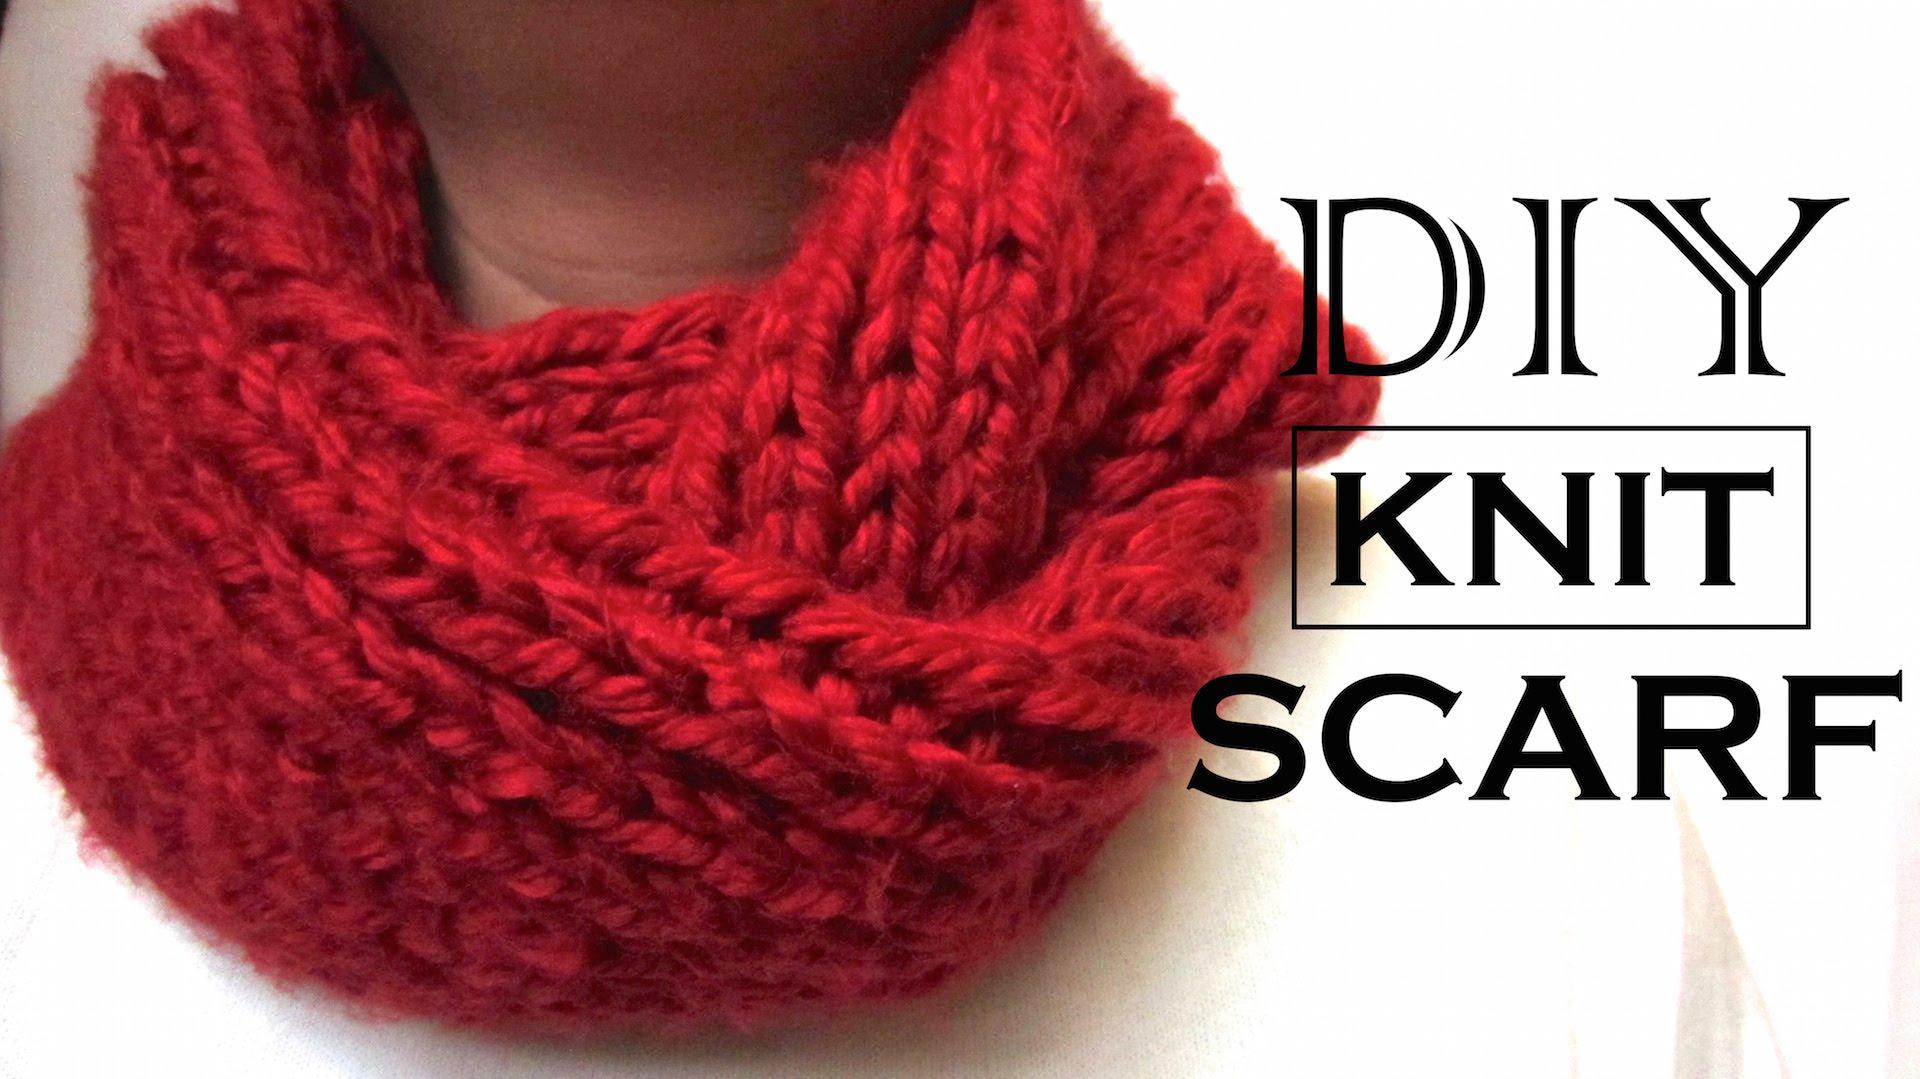 No Knit Scarves - Erieairfair